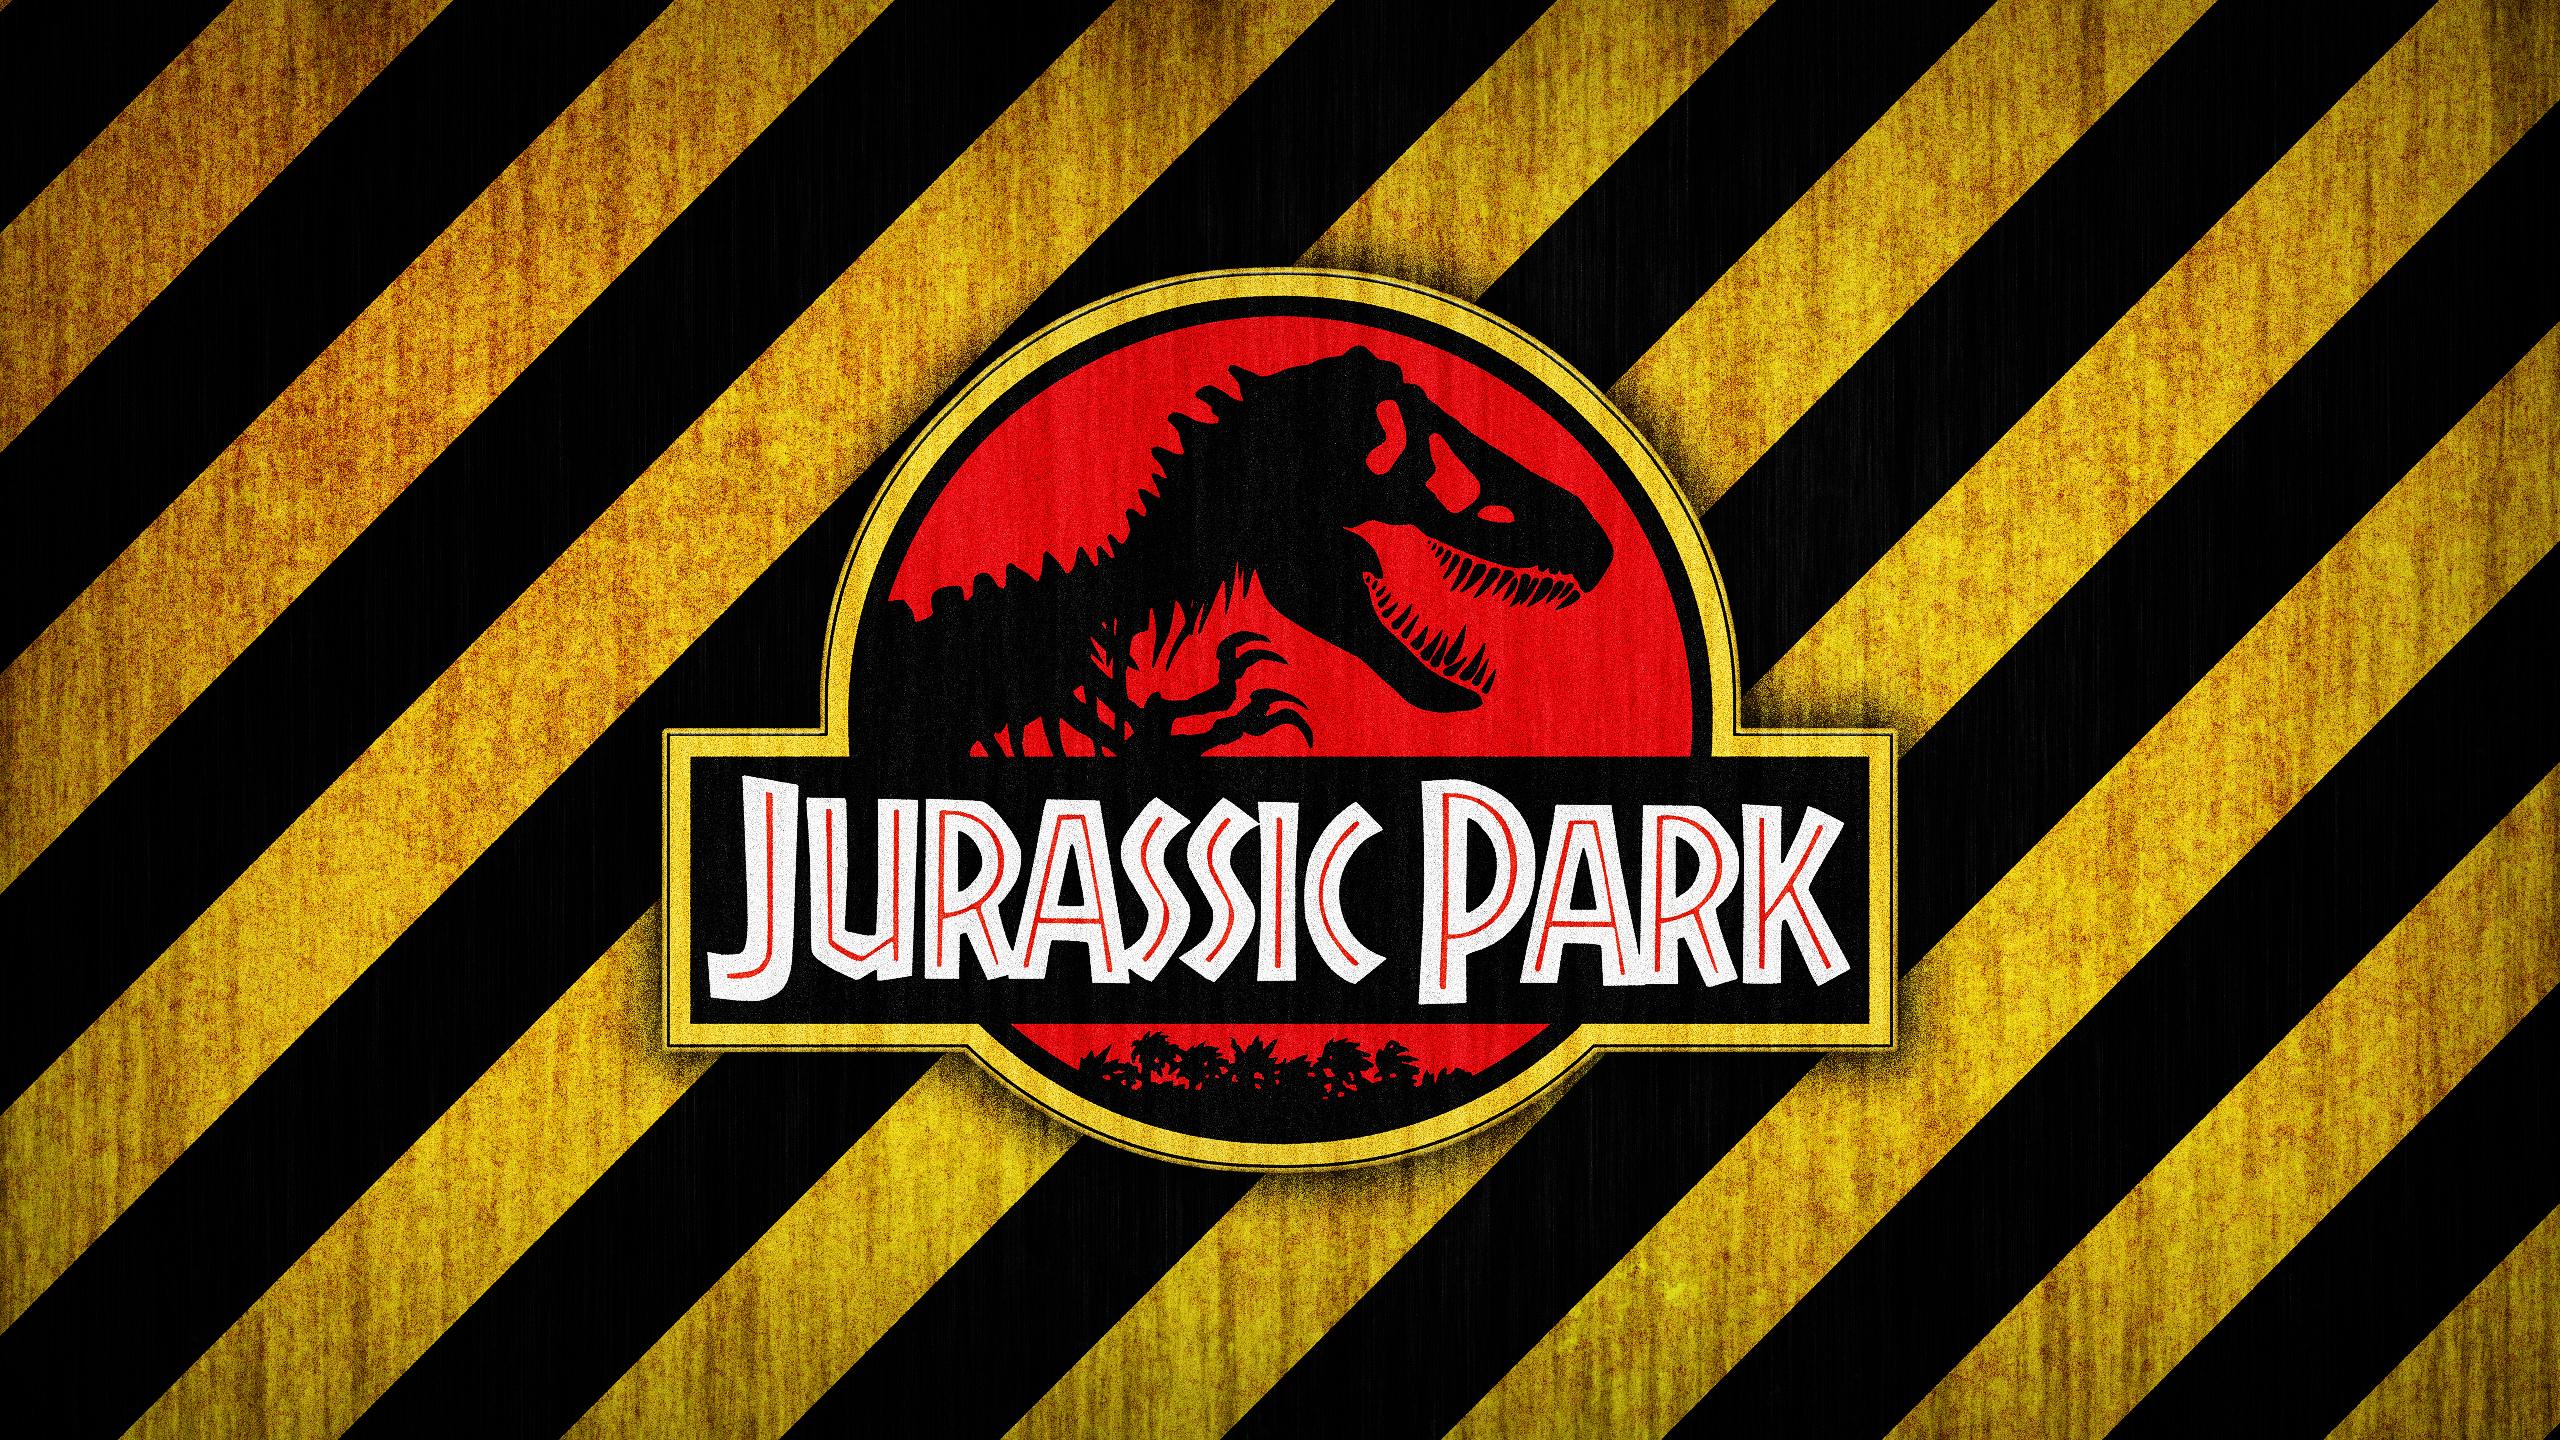 Jurassic park card 3 by chicagocubsfan24 on deviantart - Jurassic Park By Se7enfx